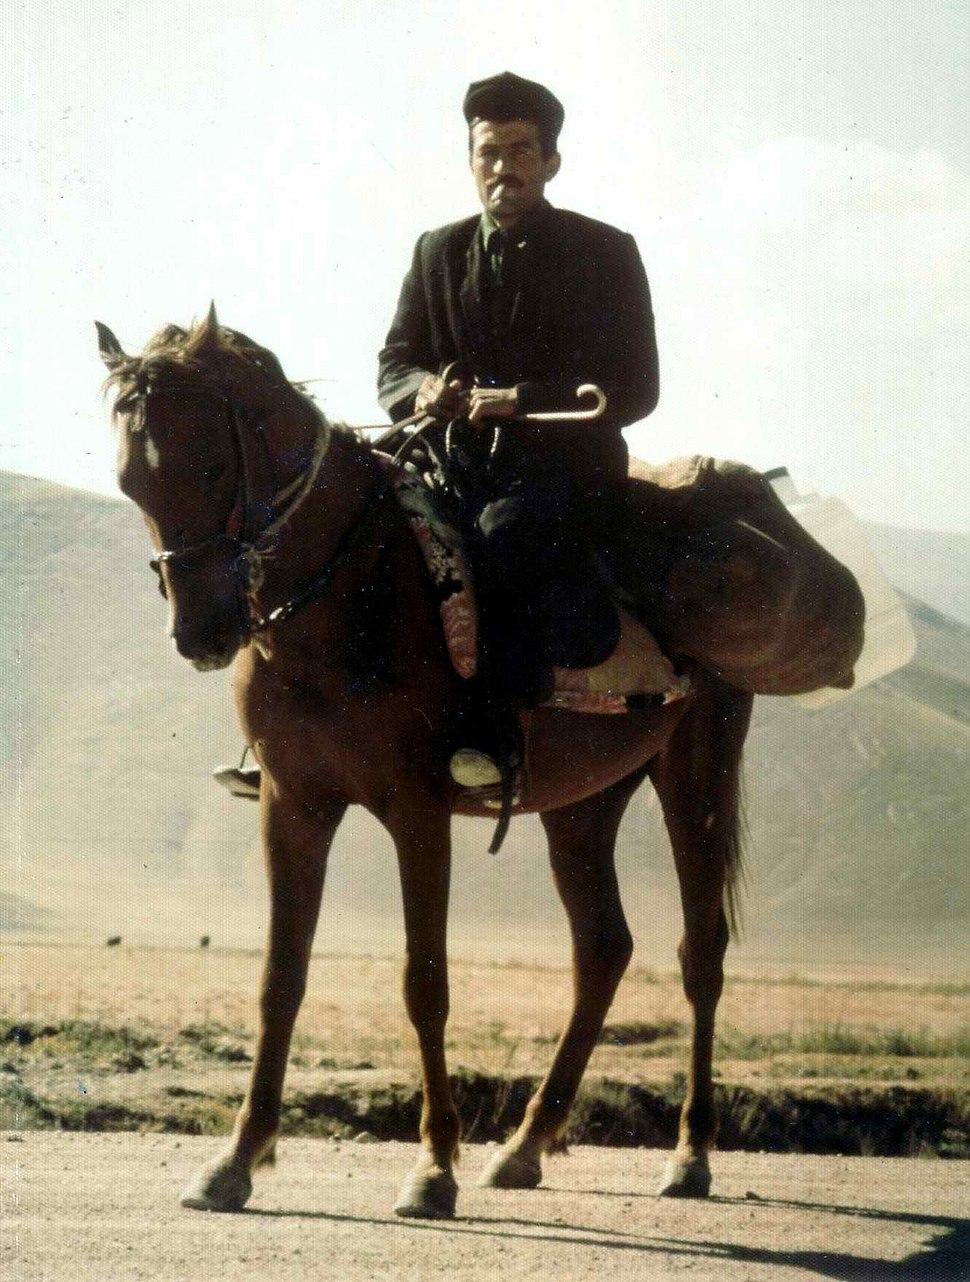 Kurdish man on horseback 1974